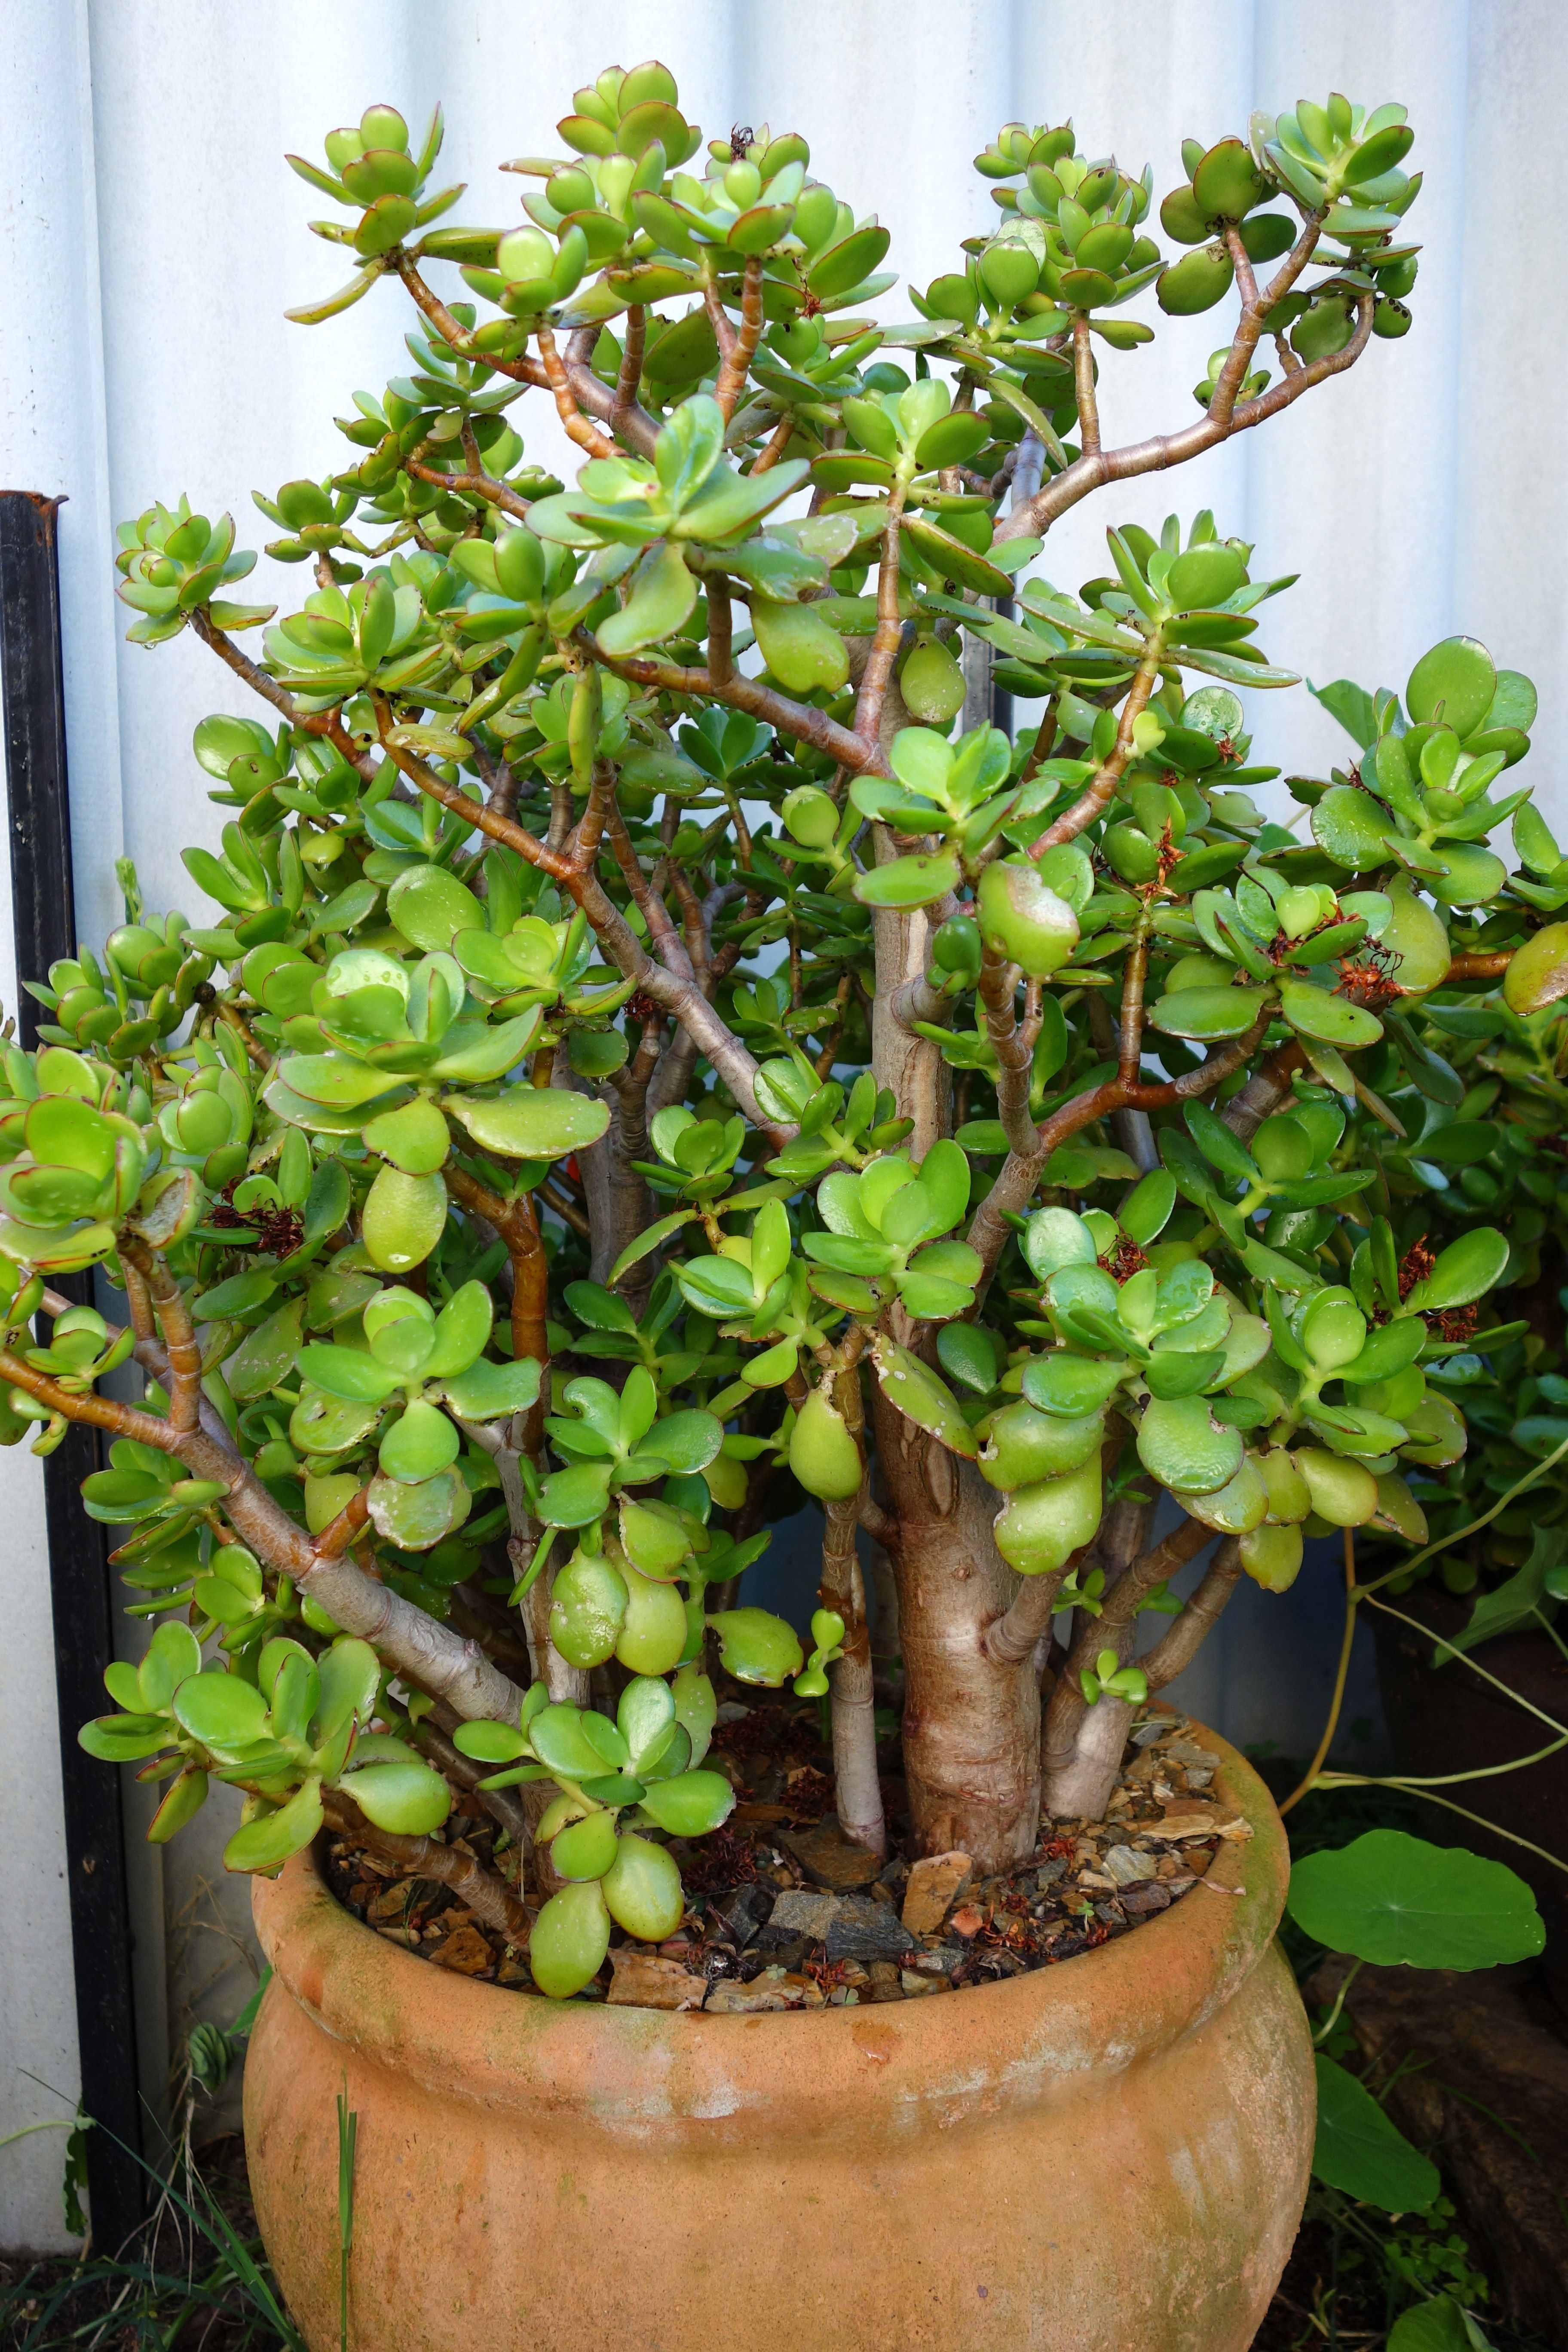 Crassula ovata in a large terracotta pot jade plants